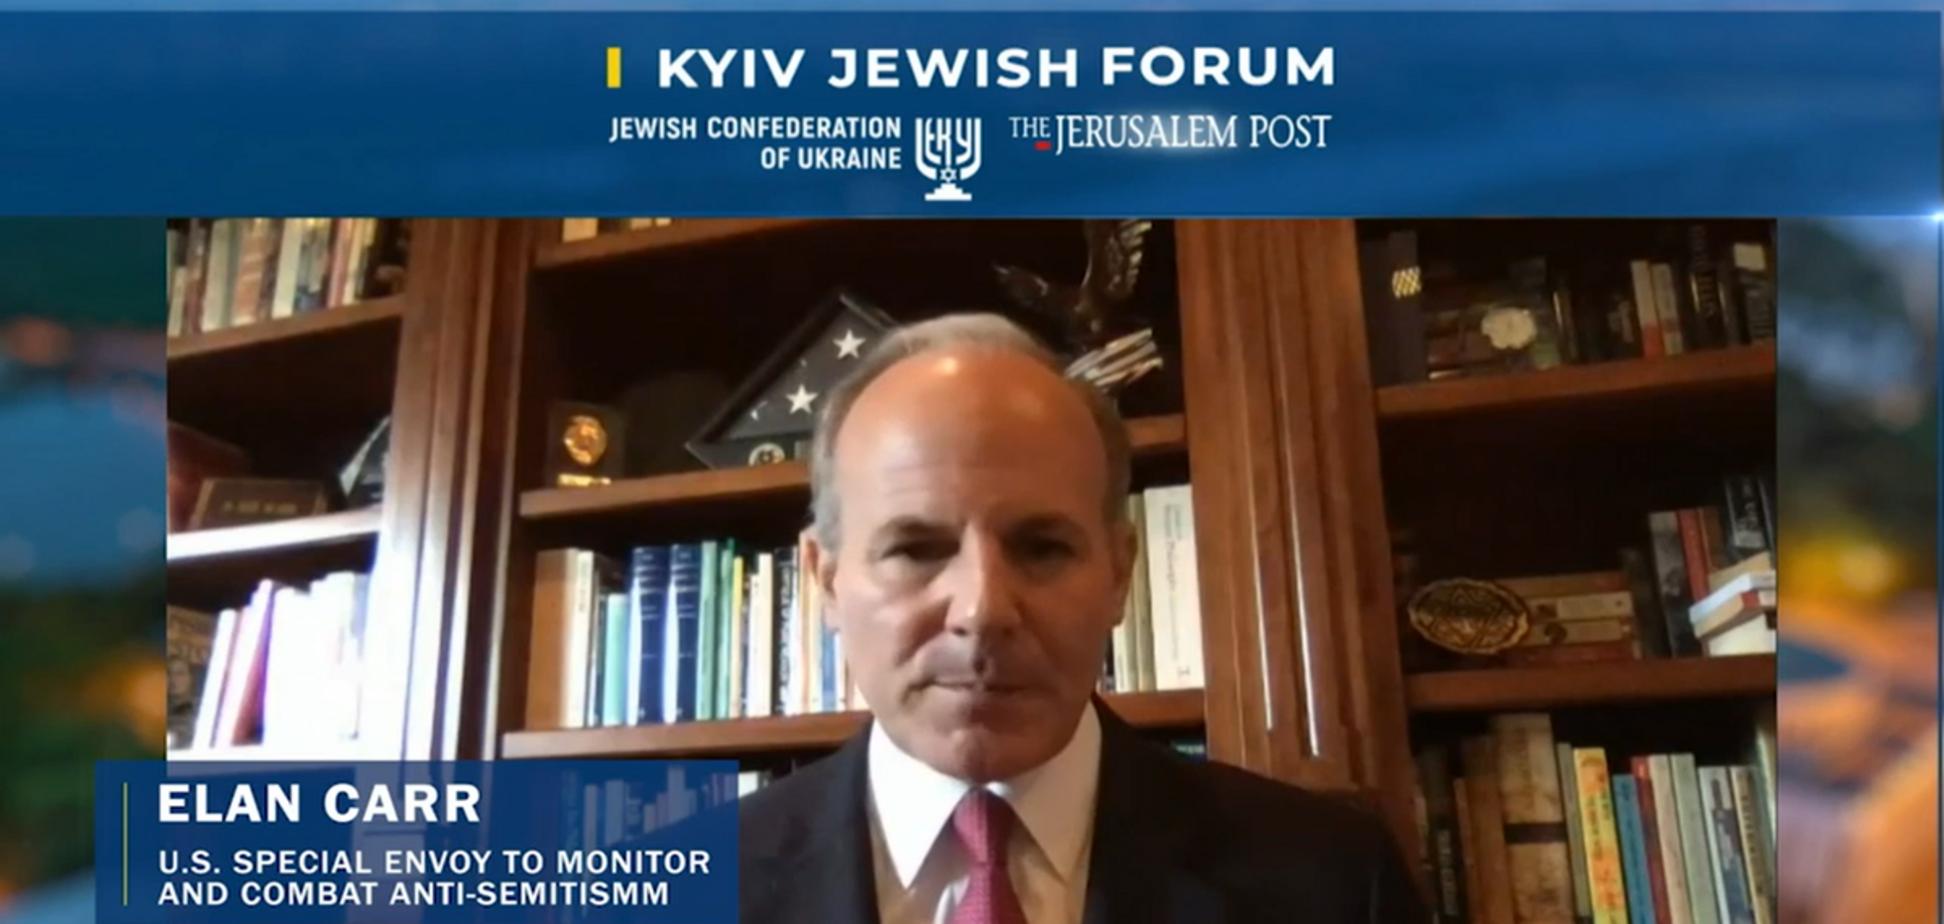 Украина успешно борется с антисемитизмом, – спецпред США на KJF 2020